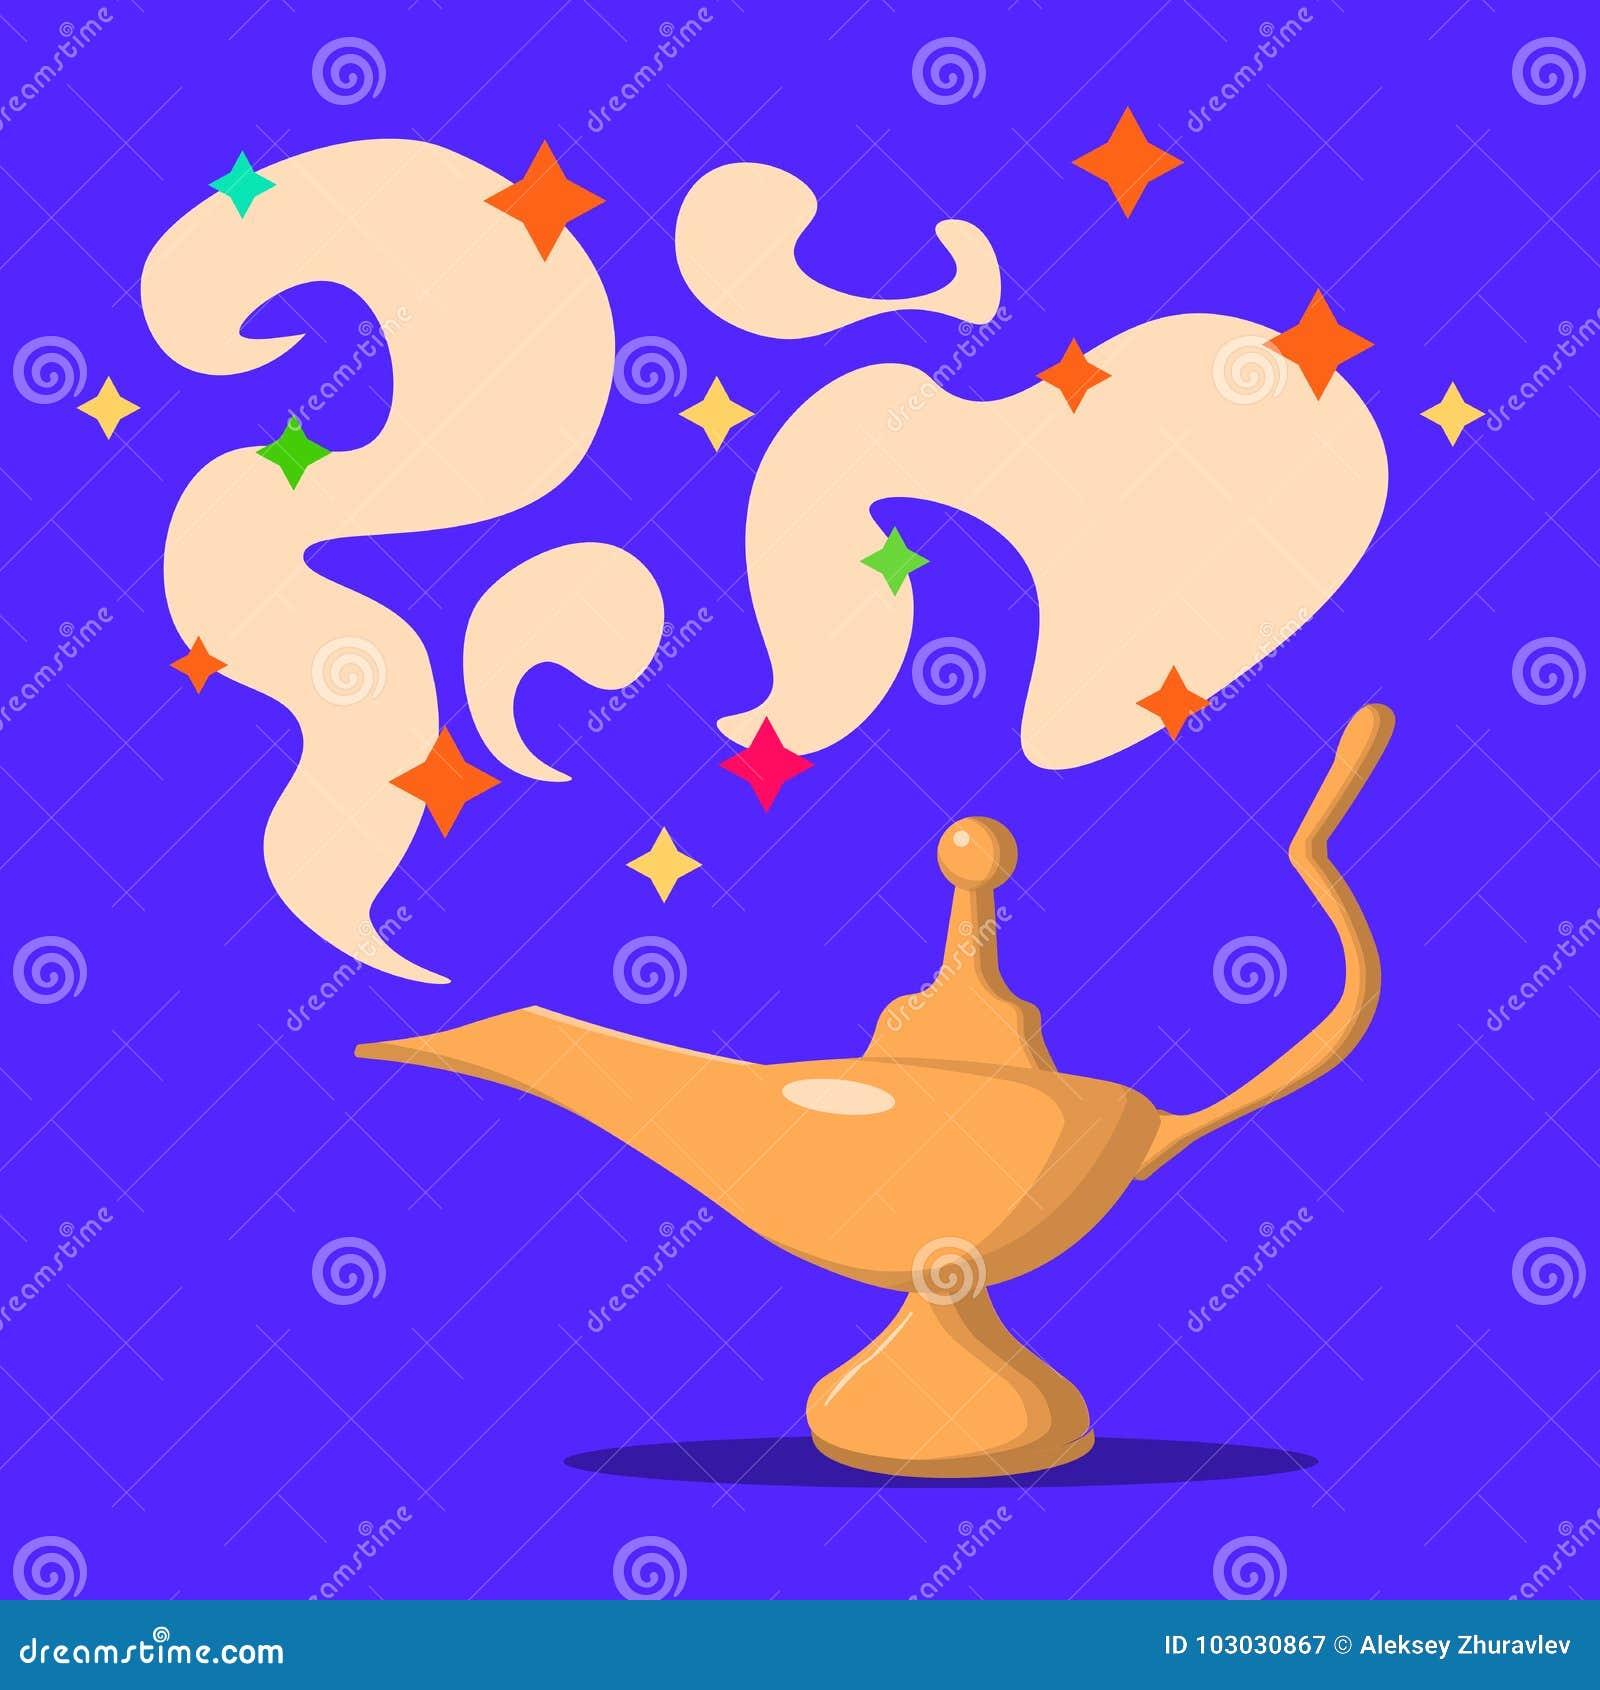 Lamp Aladdin with gin, the magic lamp of Aladdin. Flat design, vector illustration.